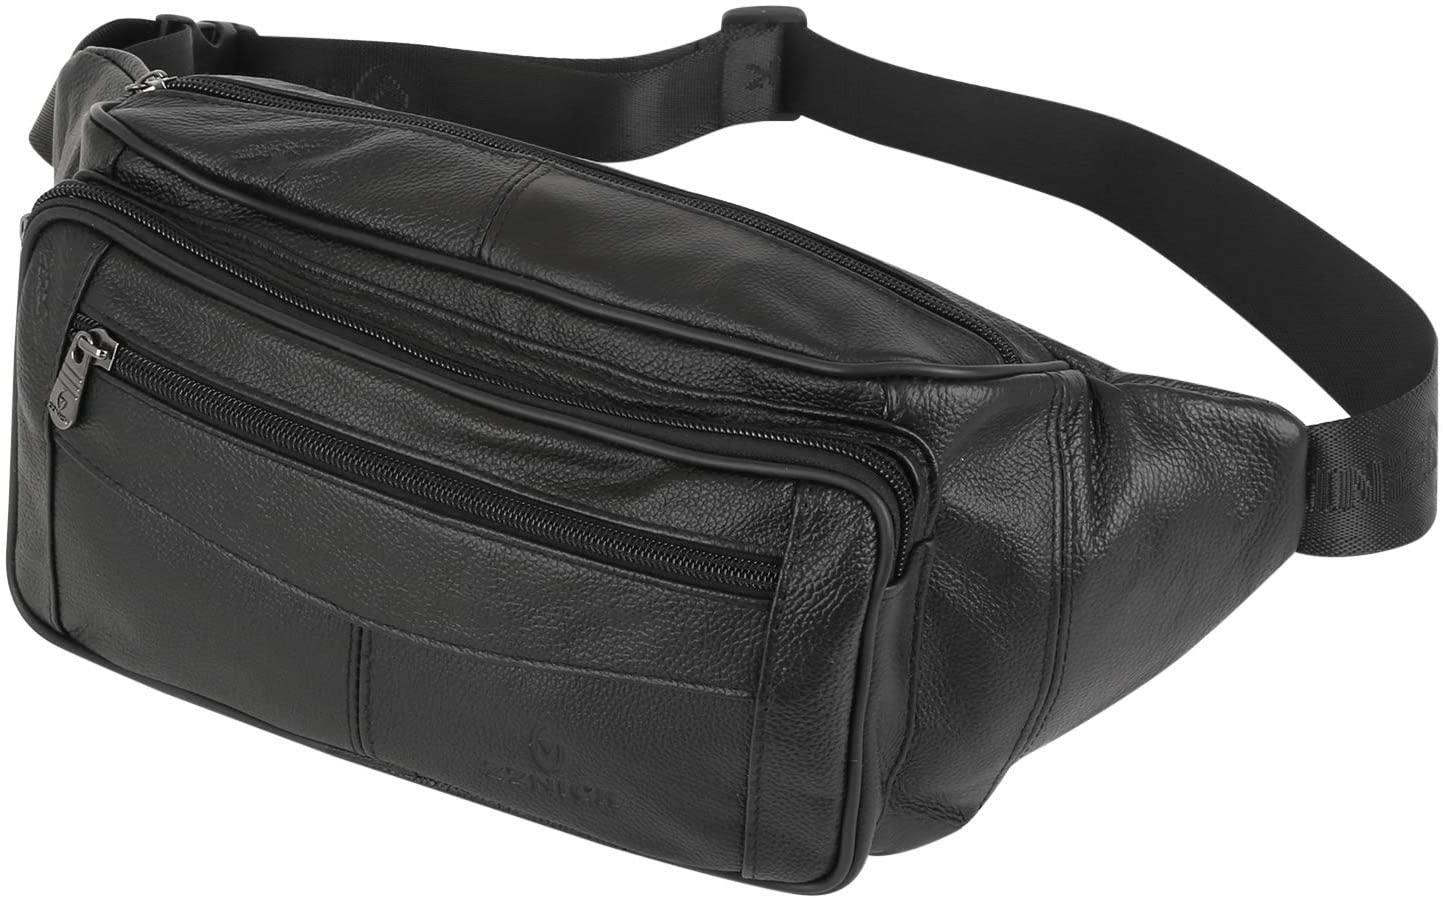 ZZNICK Genuine Leather Fanny Pack/Waist Bag/Organizer with Adjustable Belt, Multiple Pockets for Men